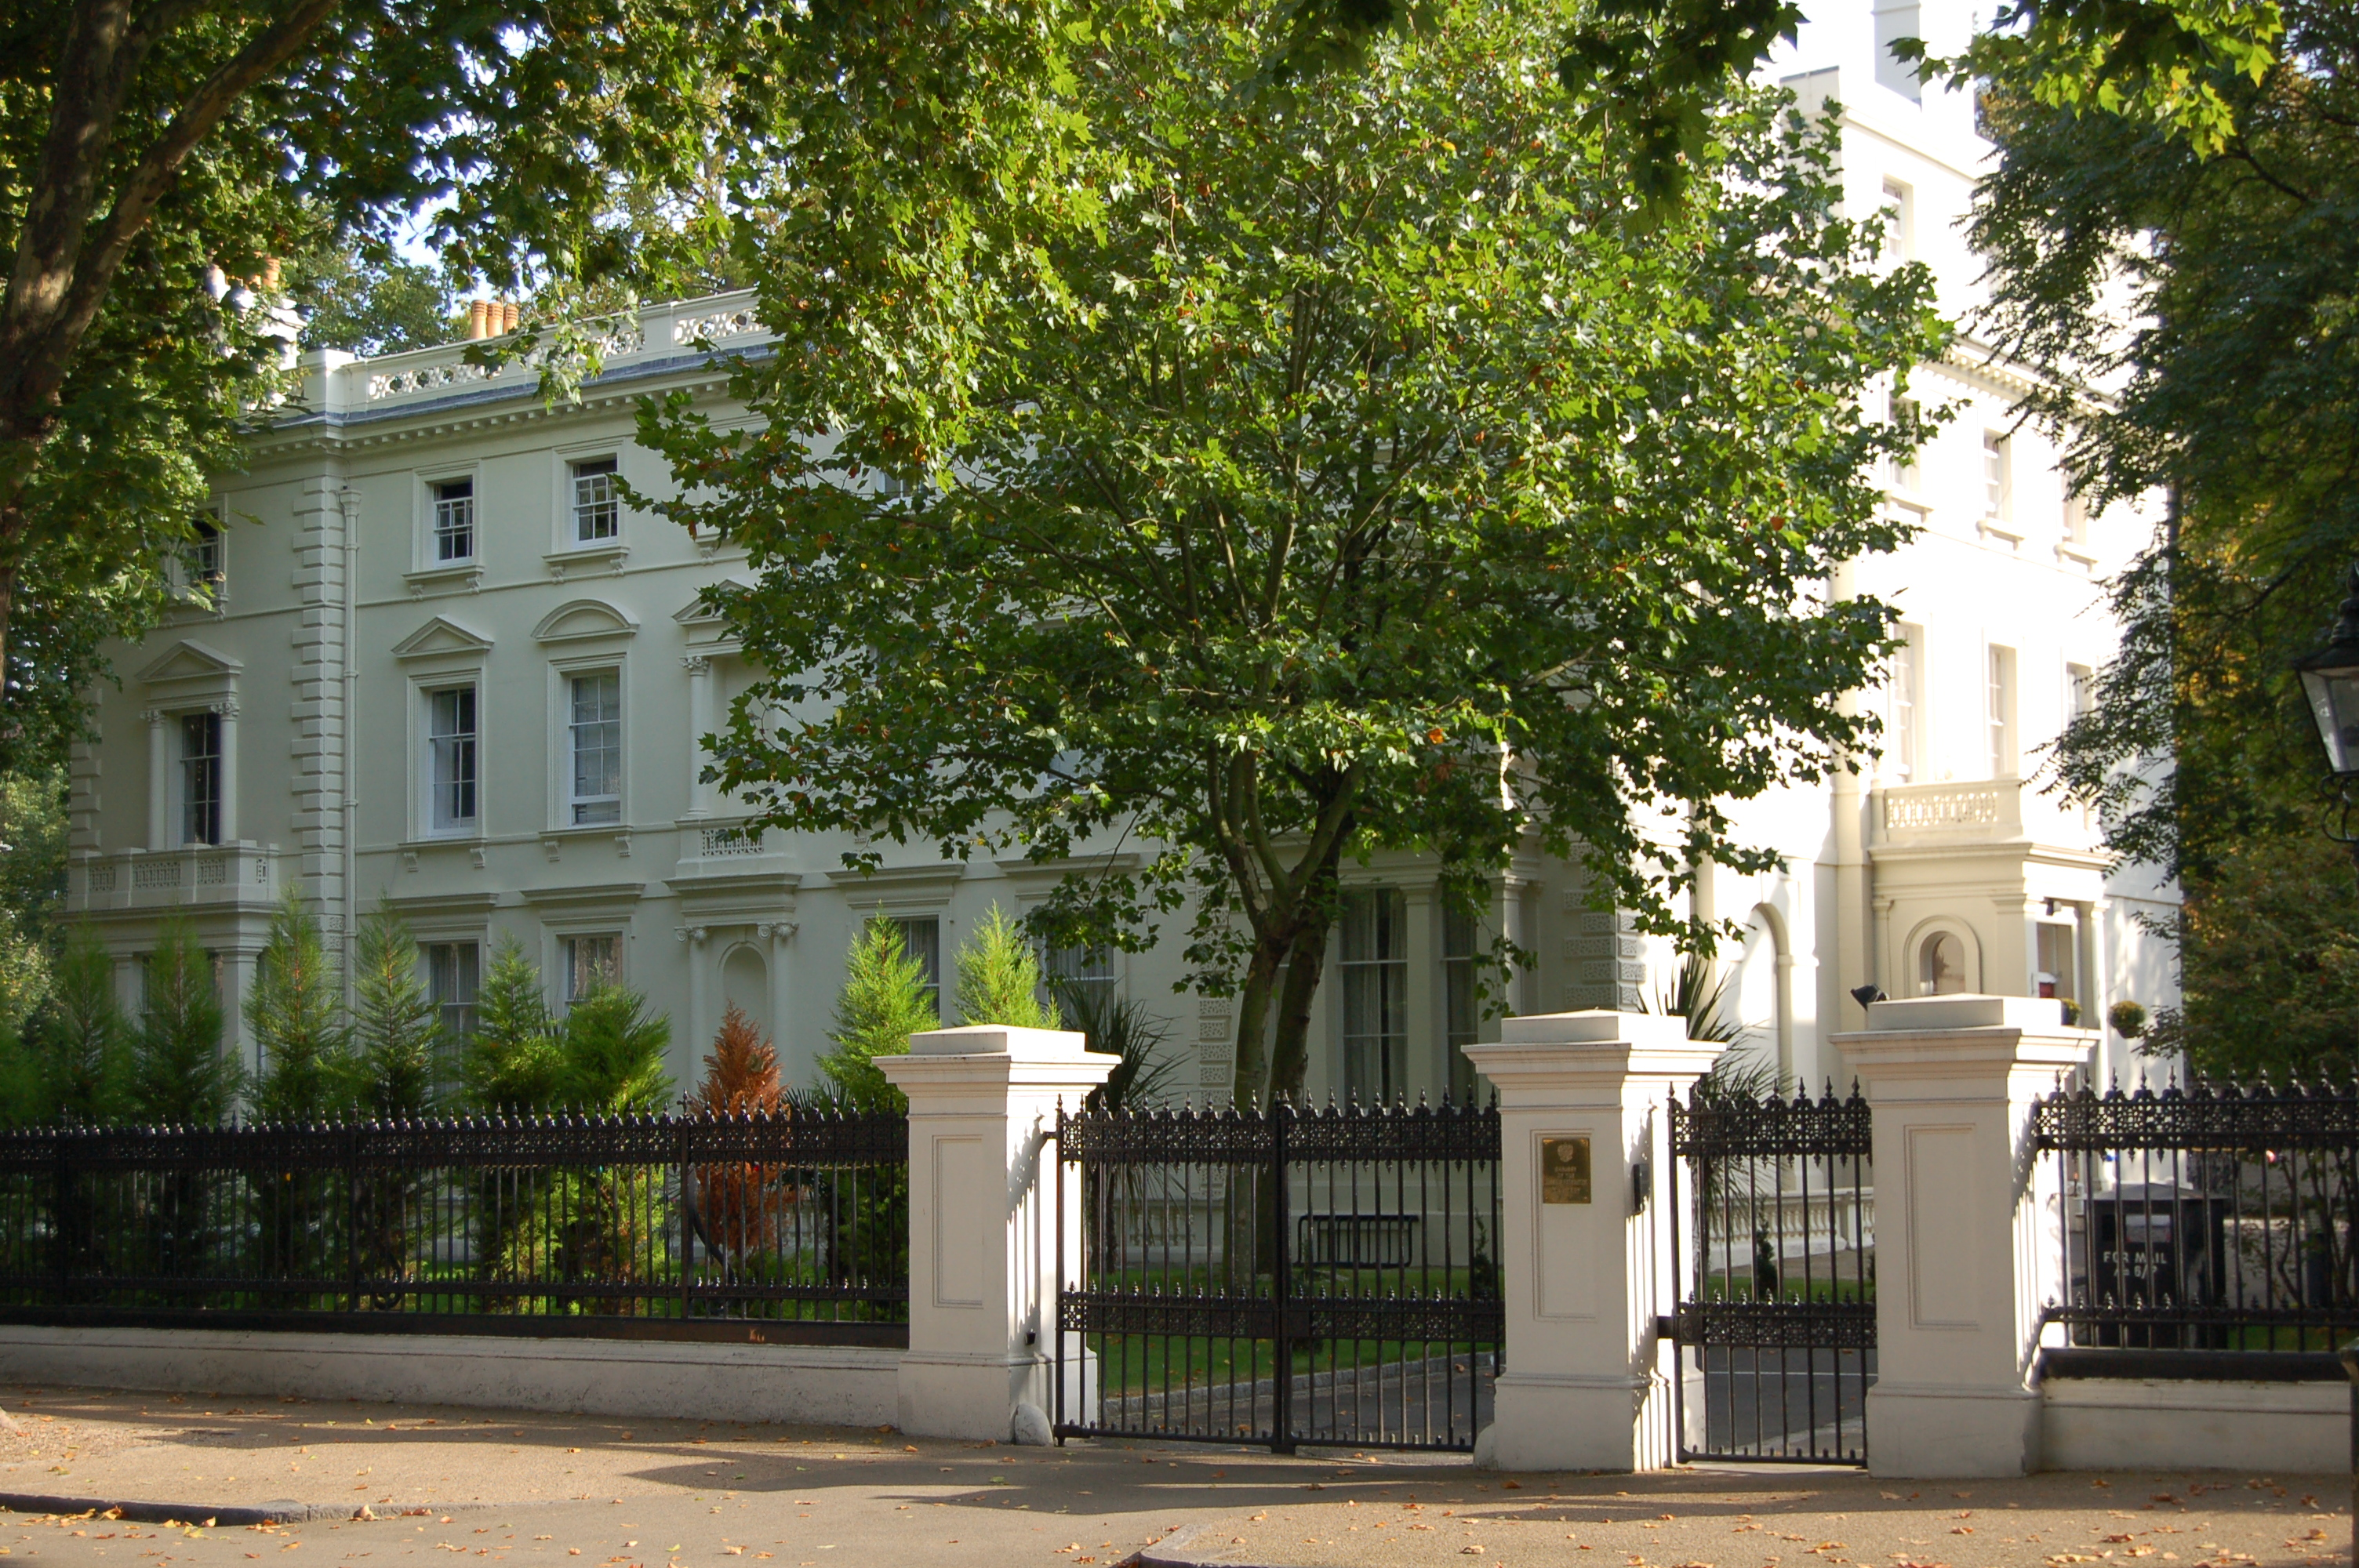 Image result for Kensington Palace Gardens, London, UK